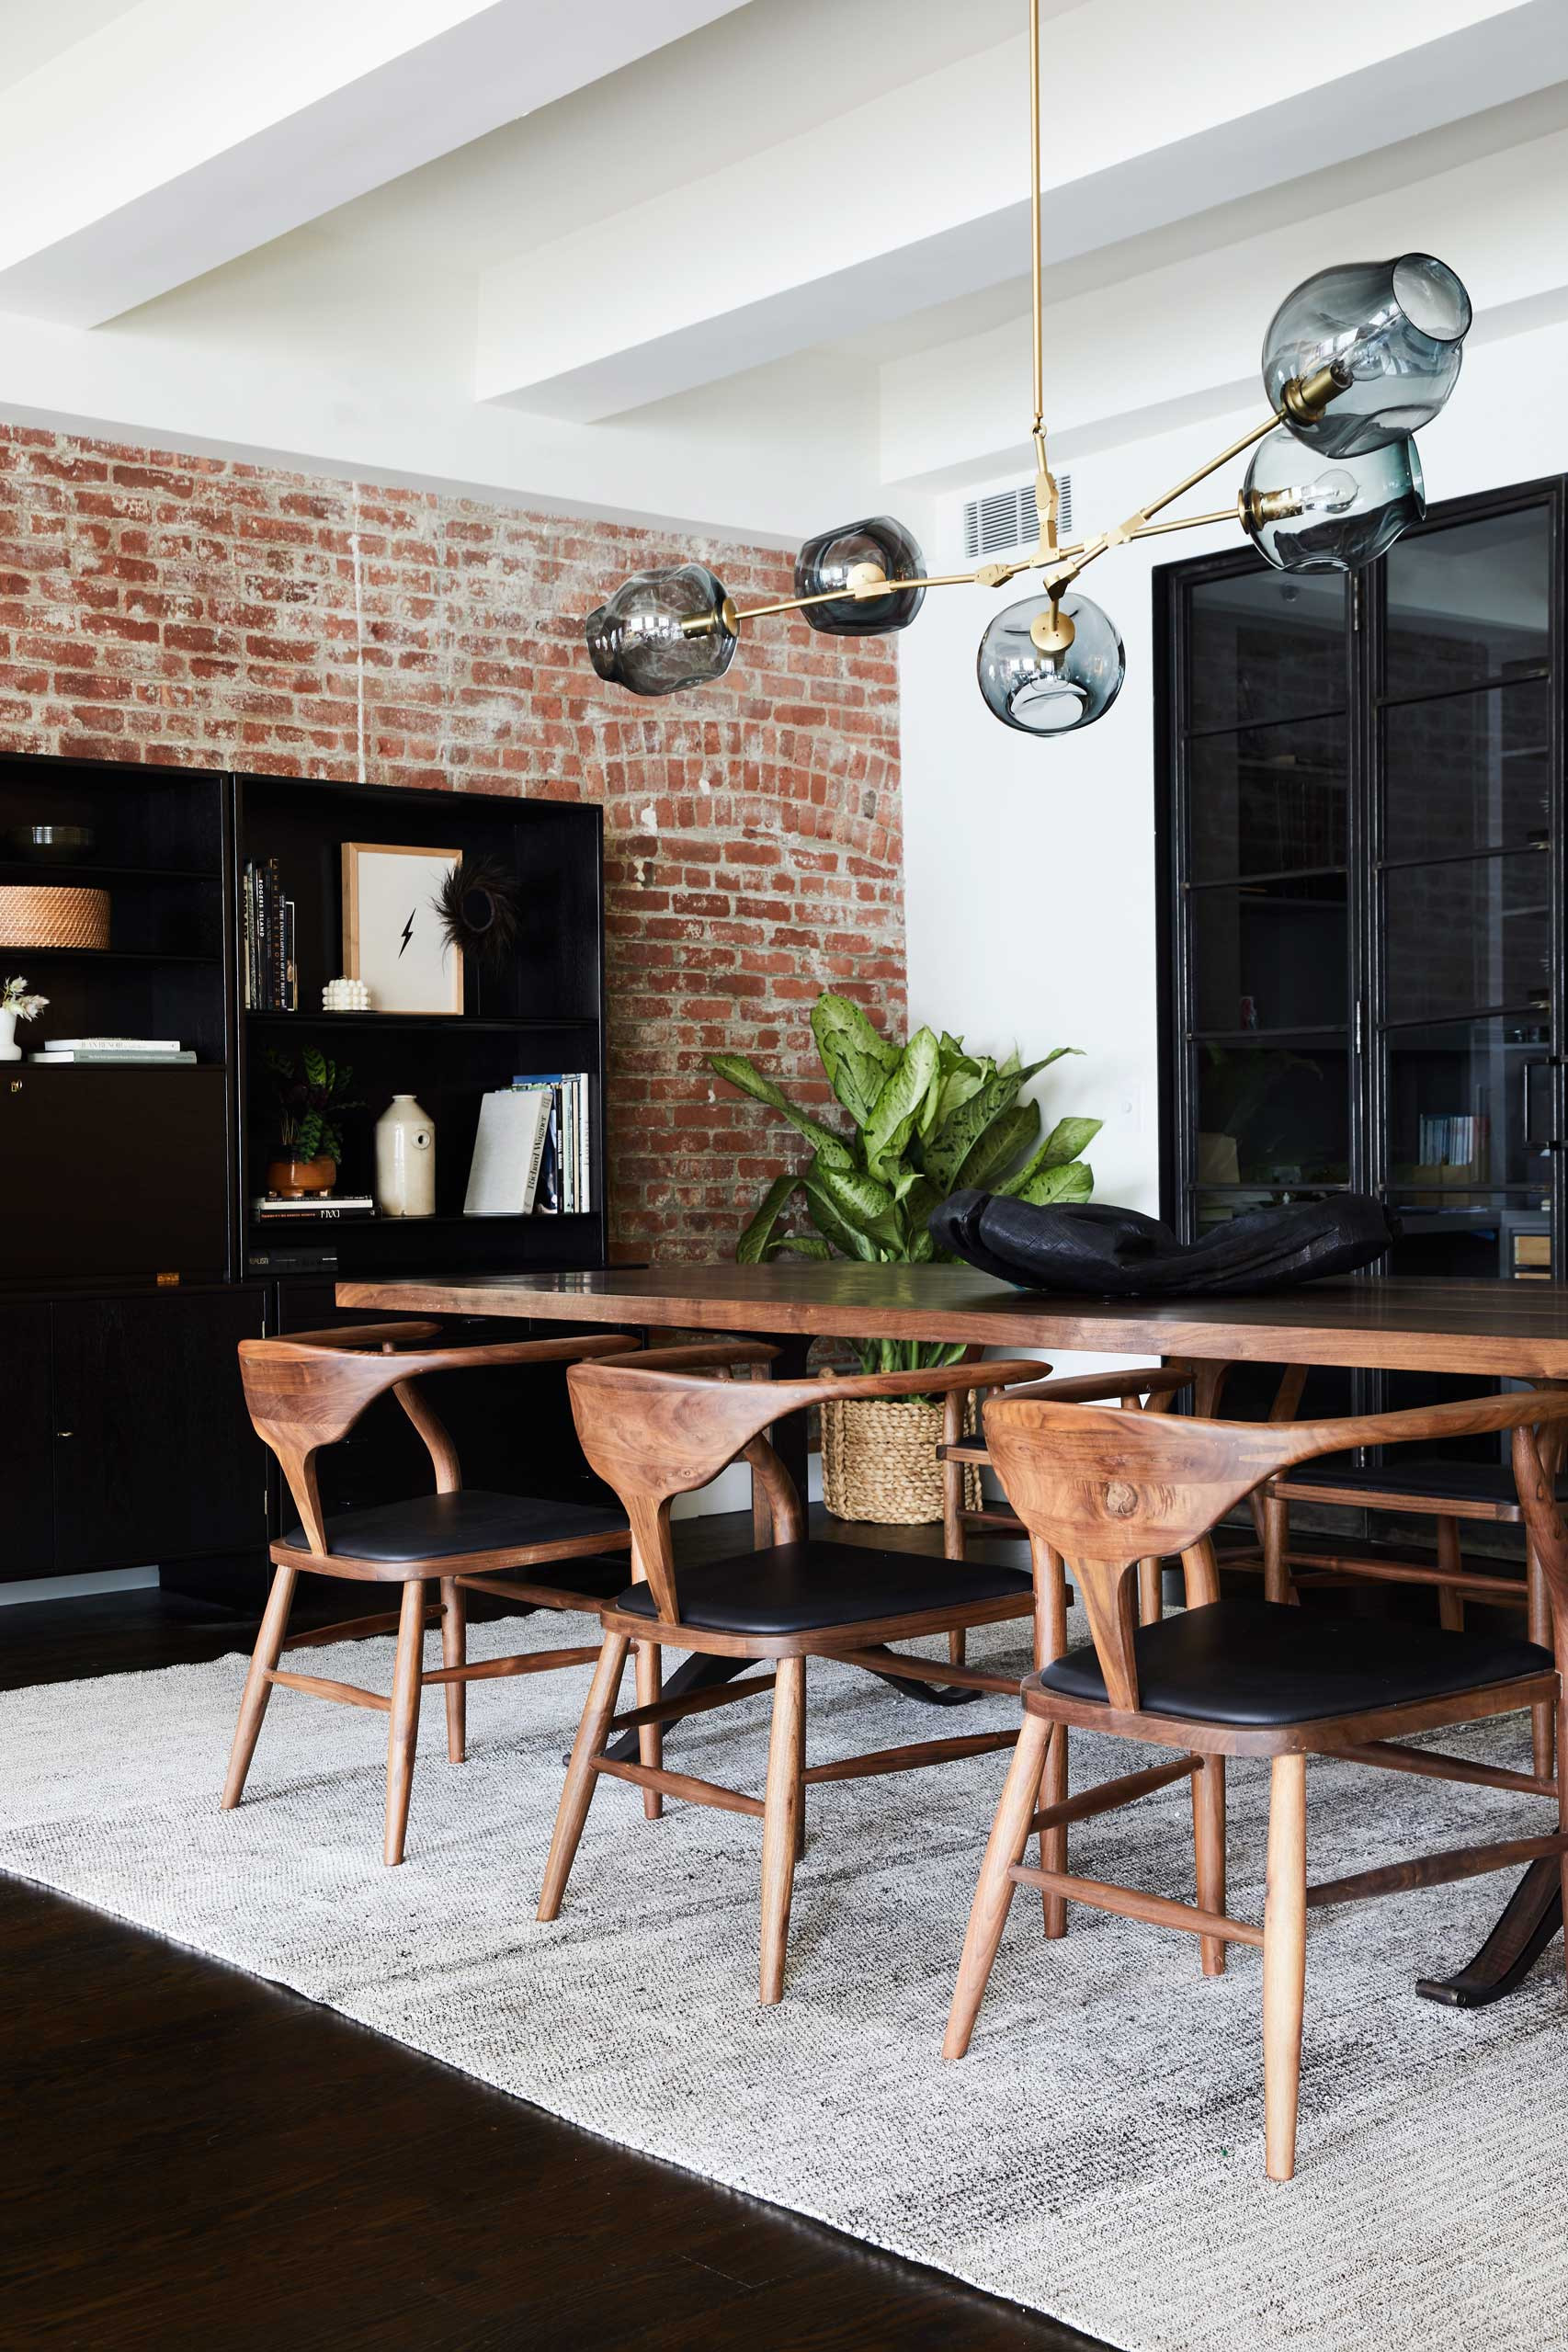 greenwich-street-loft-dining-room-2.jpg